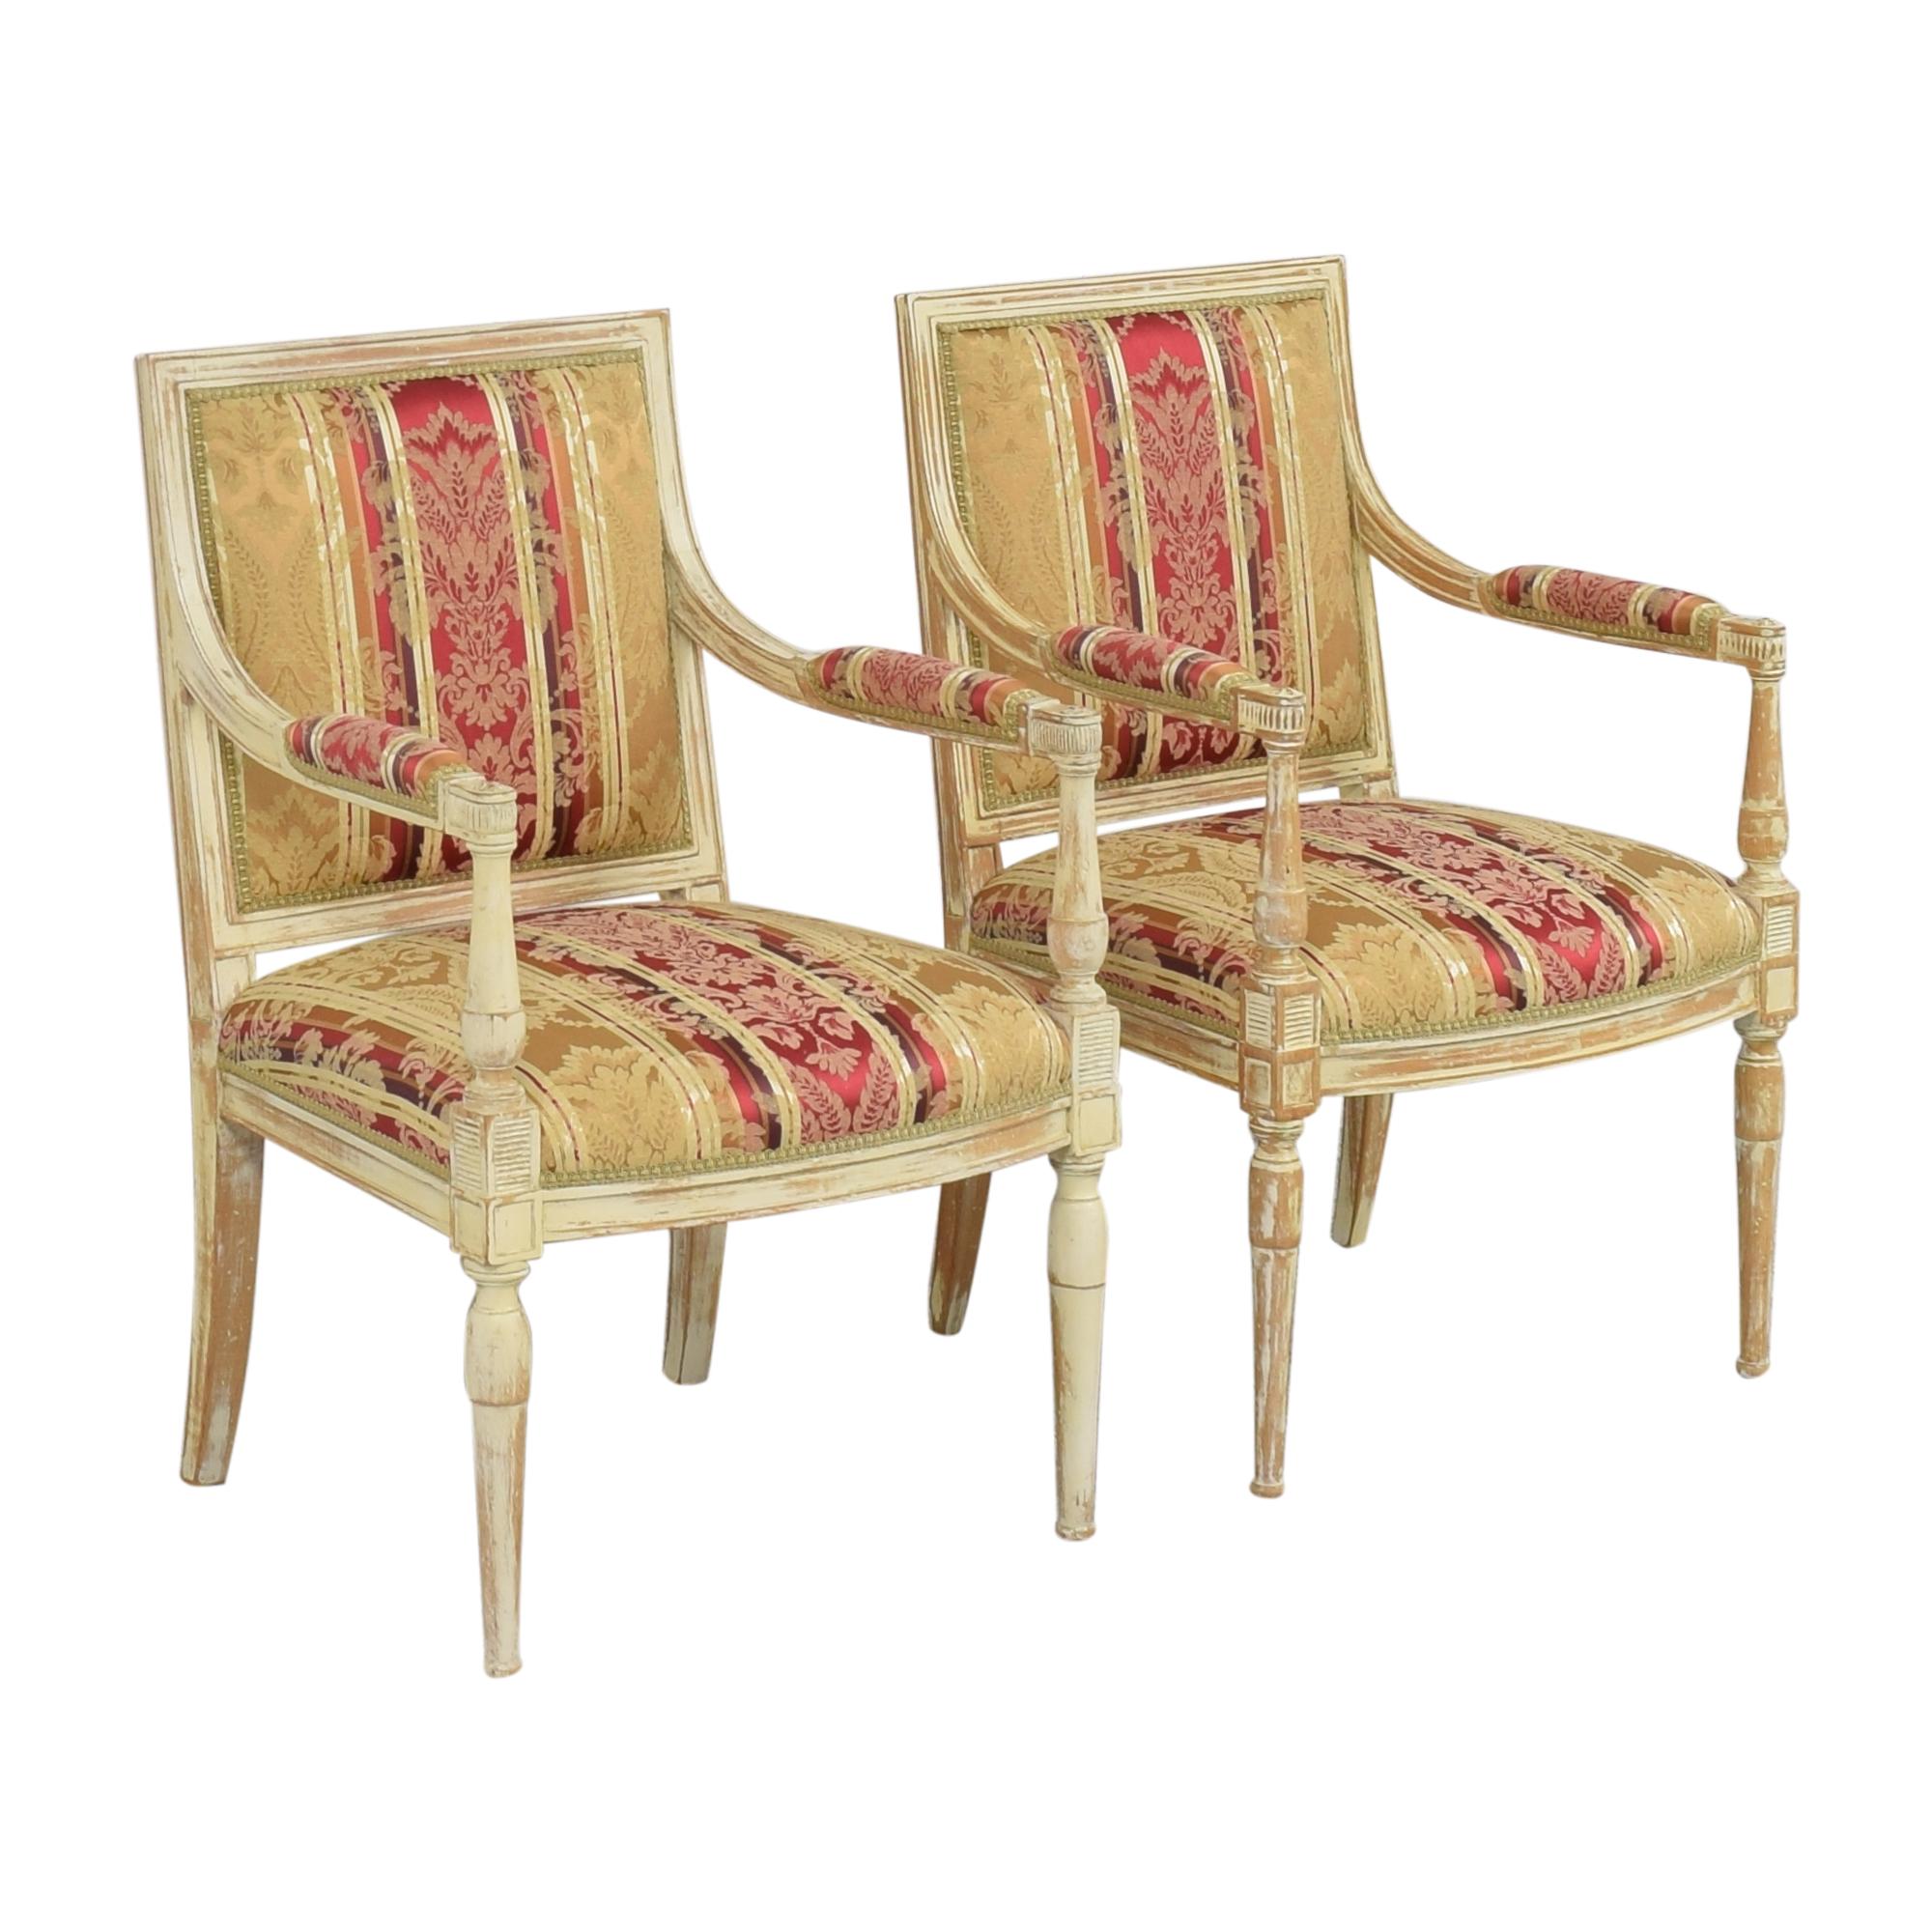 buy ABC Carpet & Home ABC Carpet & Home Louis XVI Style Chairs online